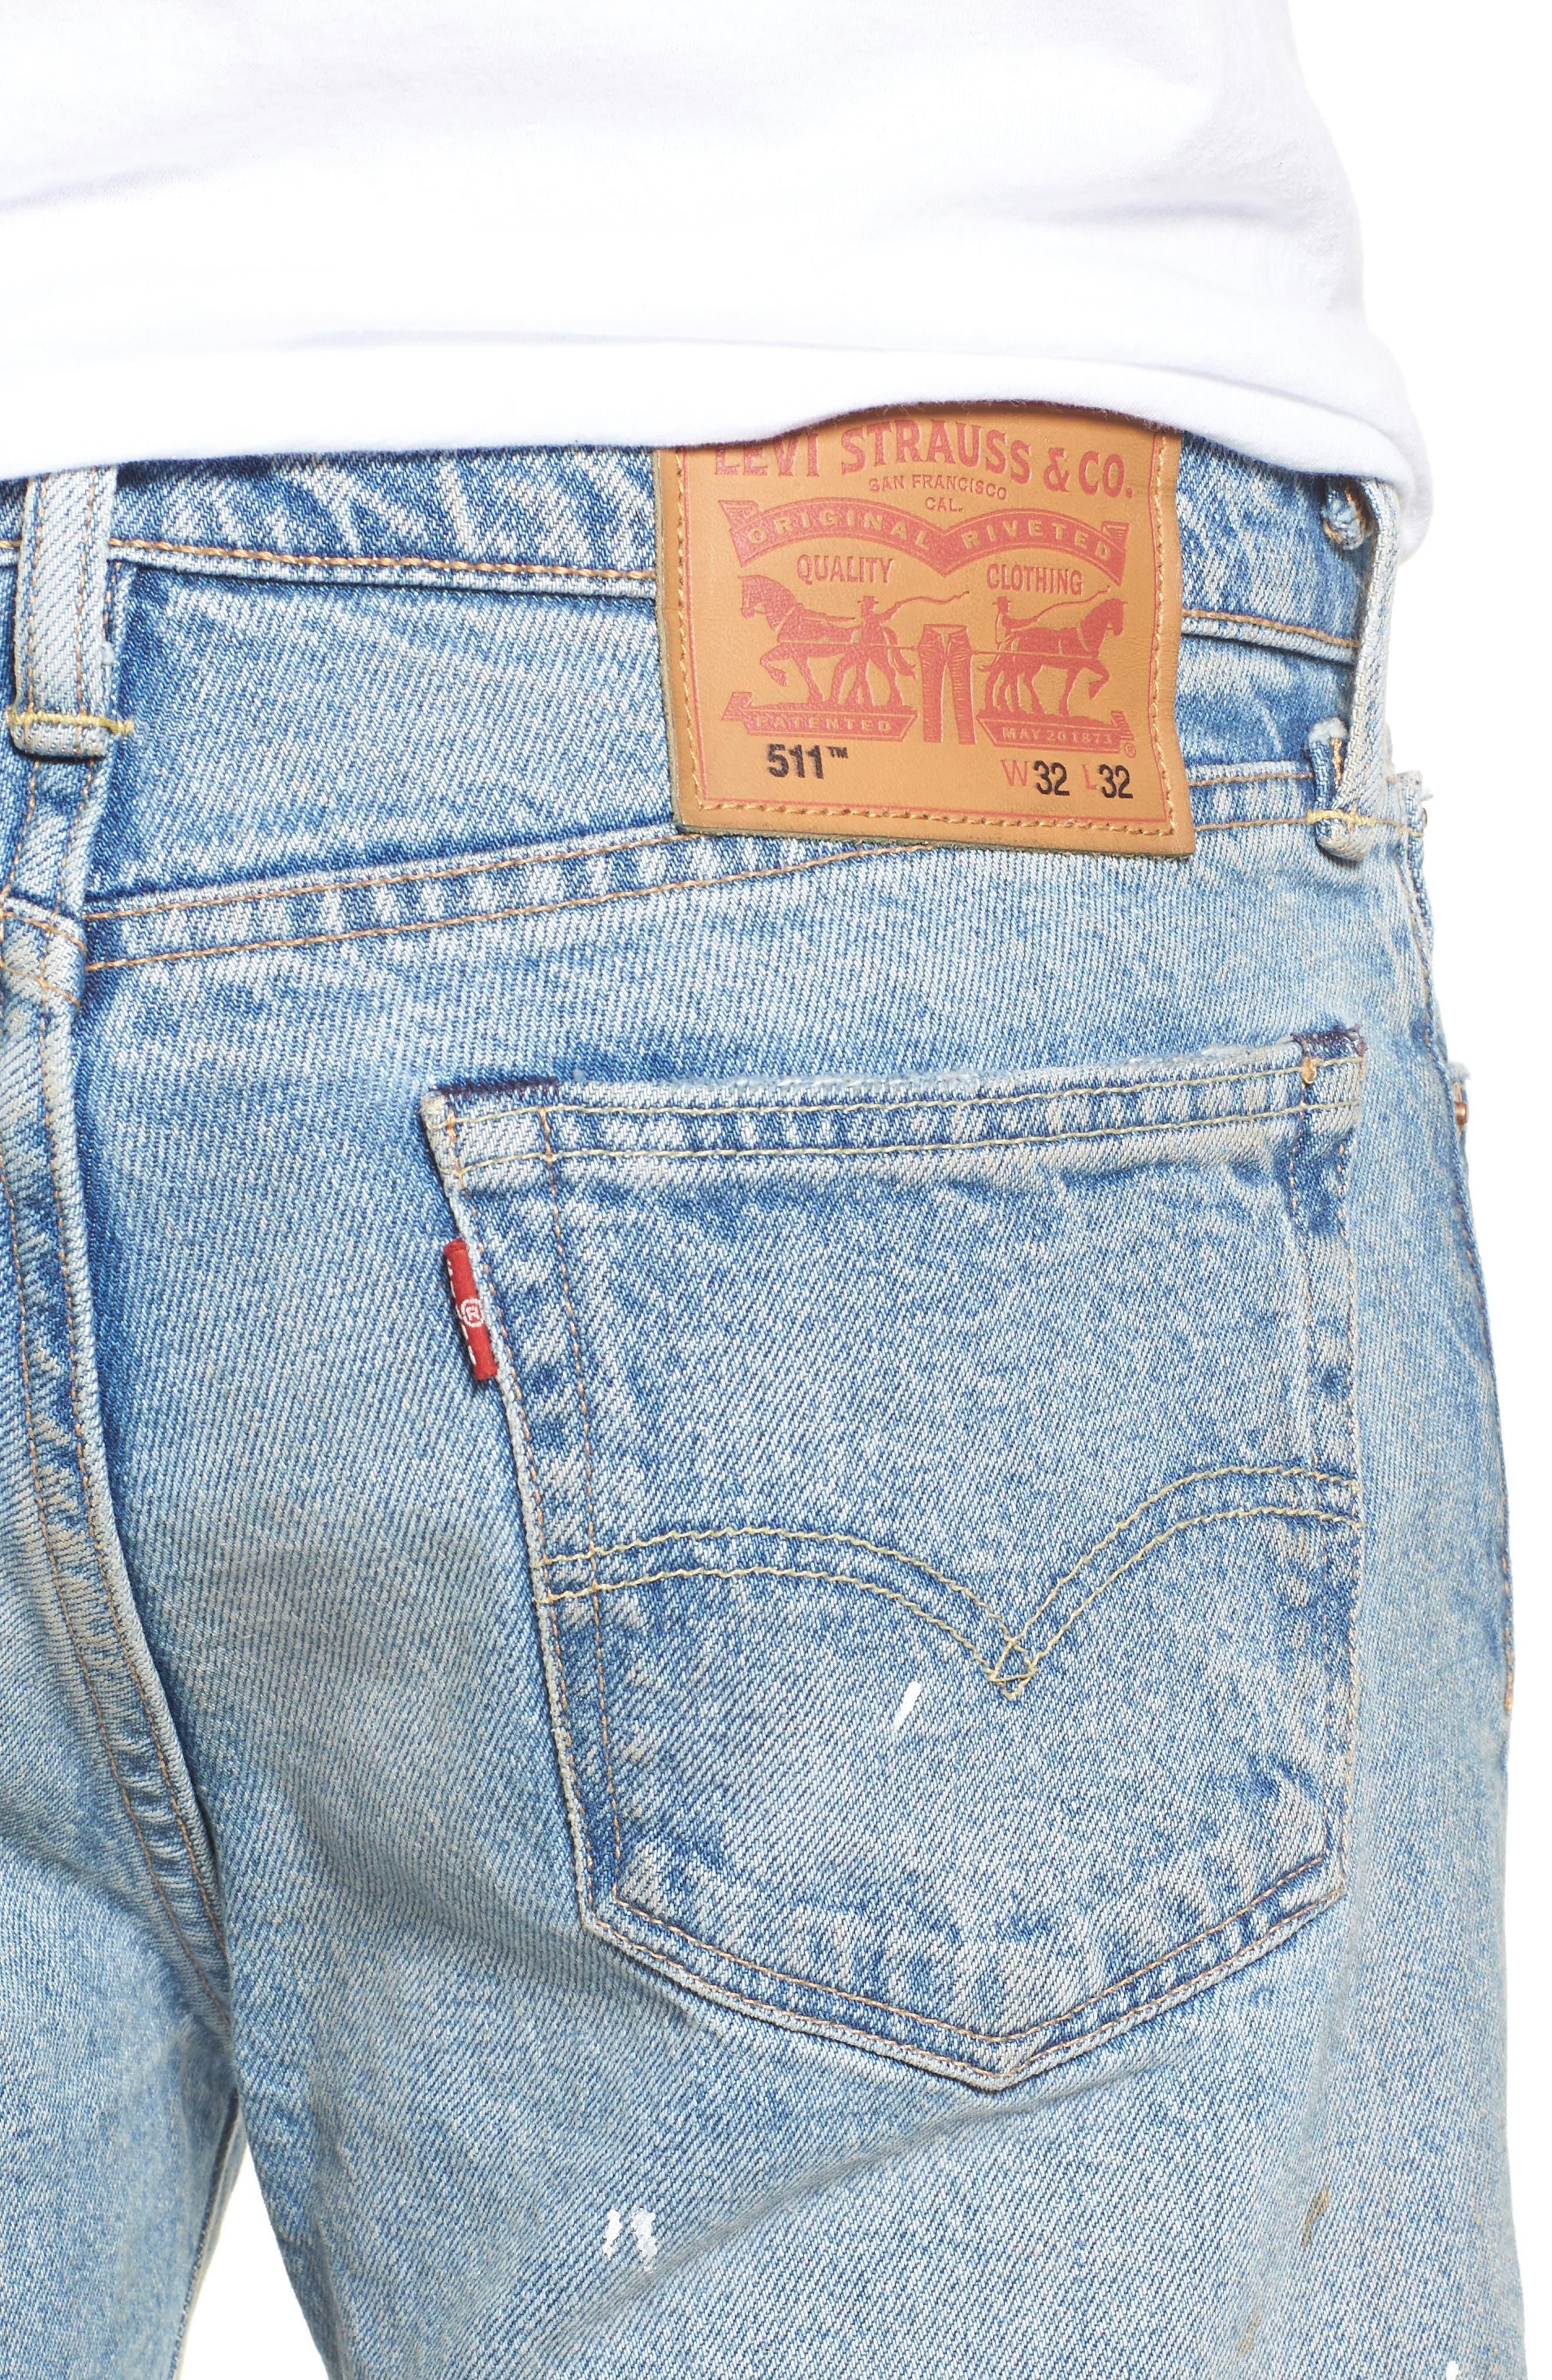 511<sup>™</sup> Slim Fit Jeans,                             Alternate thumbnail 4, color,                             Michigan Dx